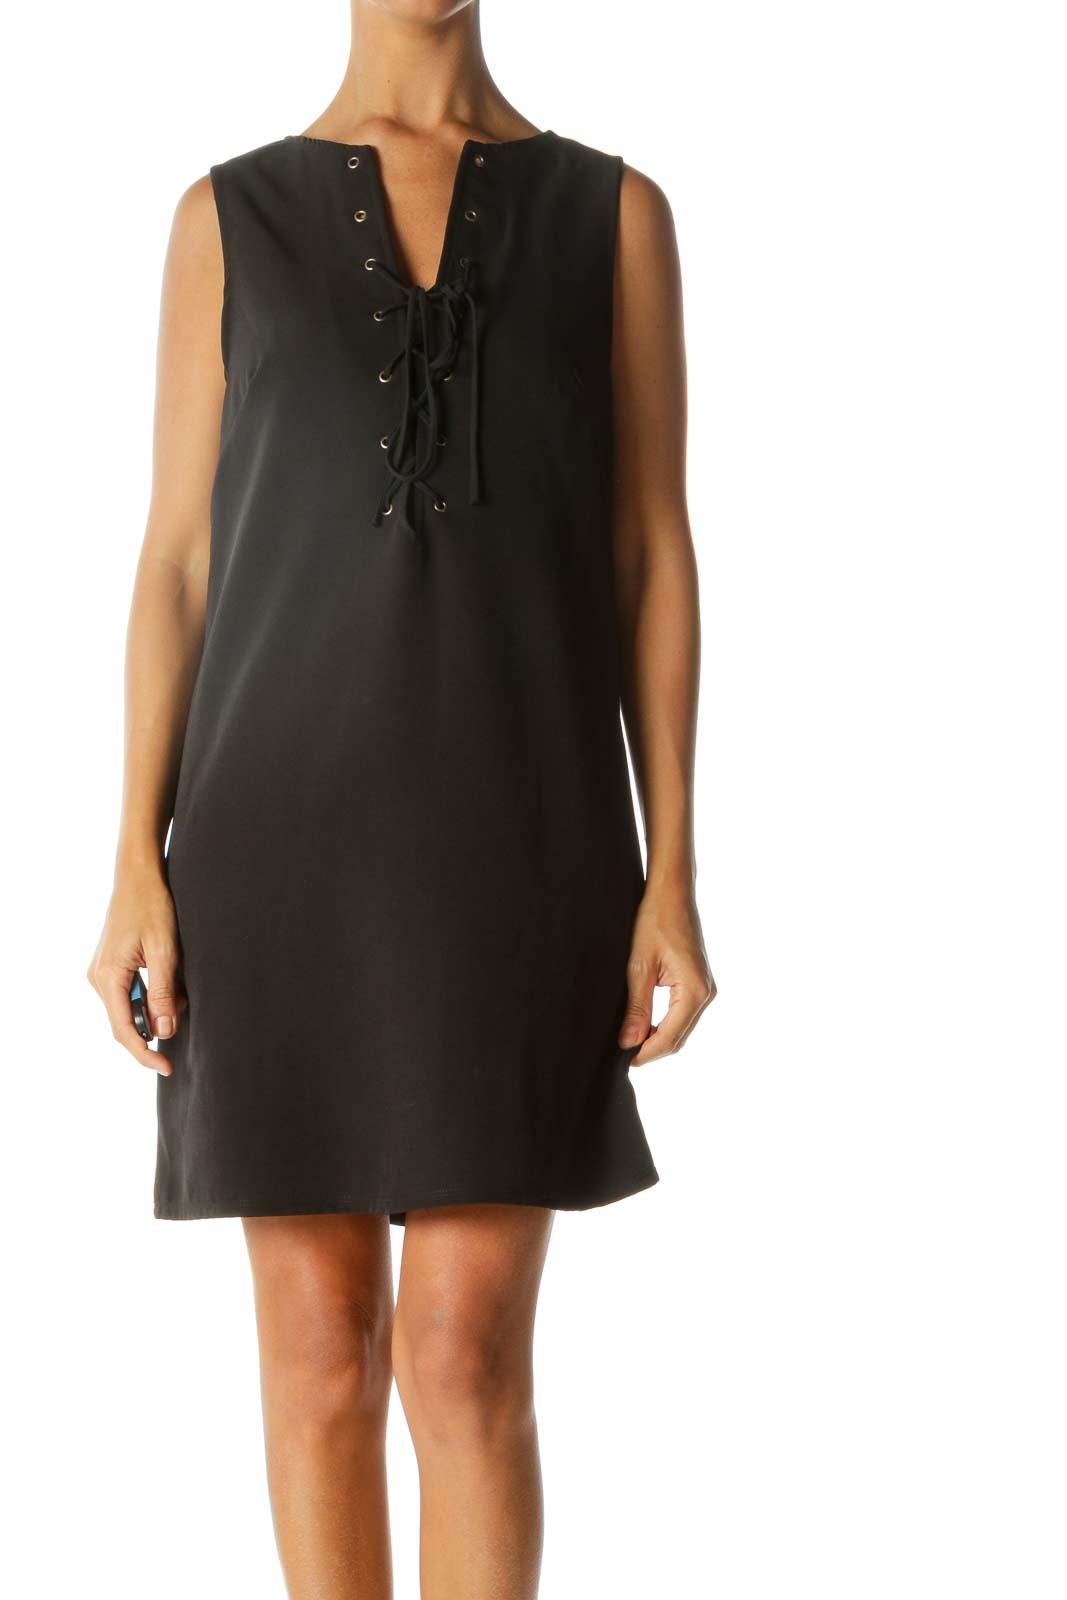 Black Crisscross Front Sleeveless Cocktail Dress Front